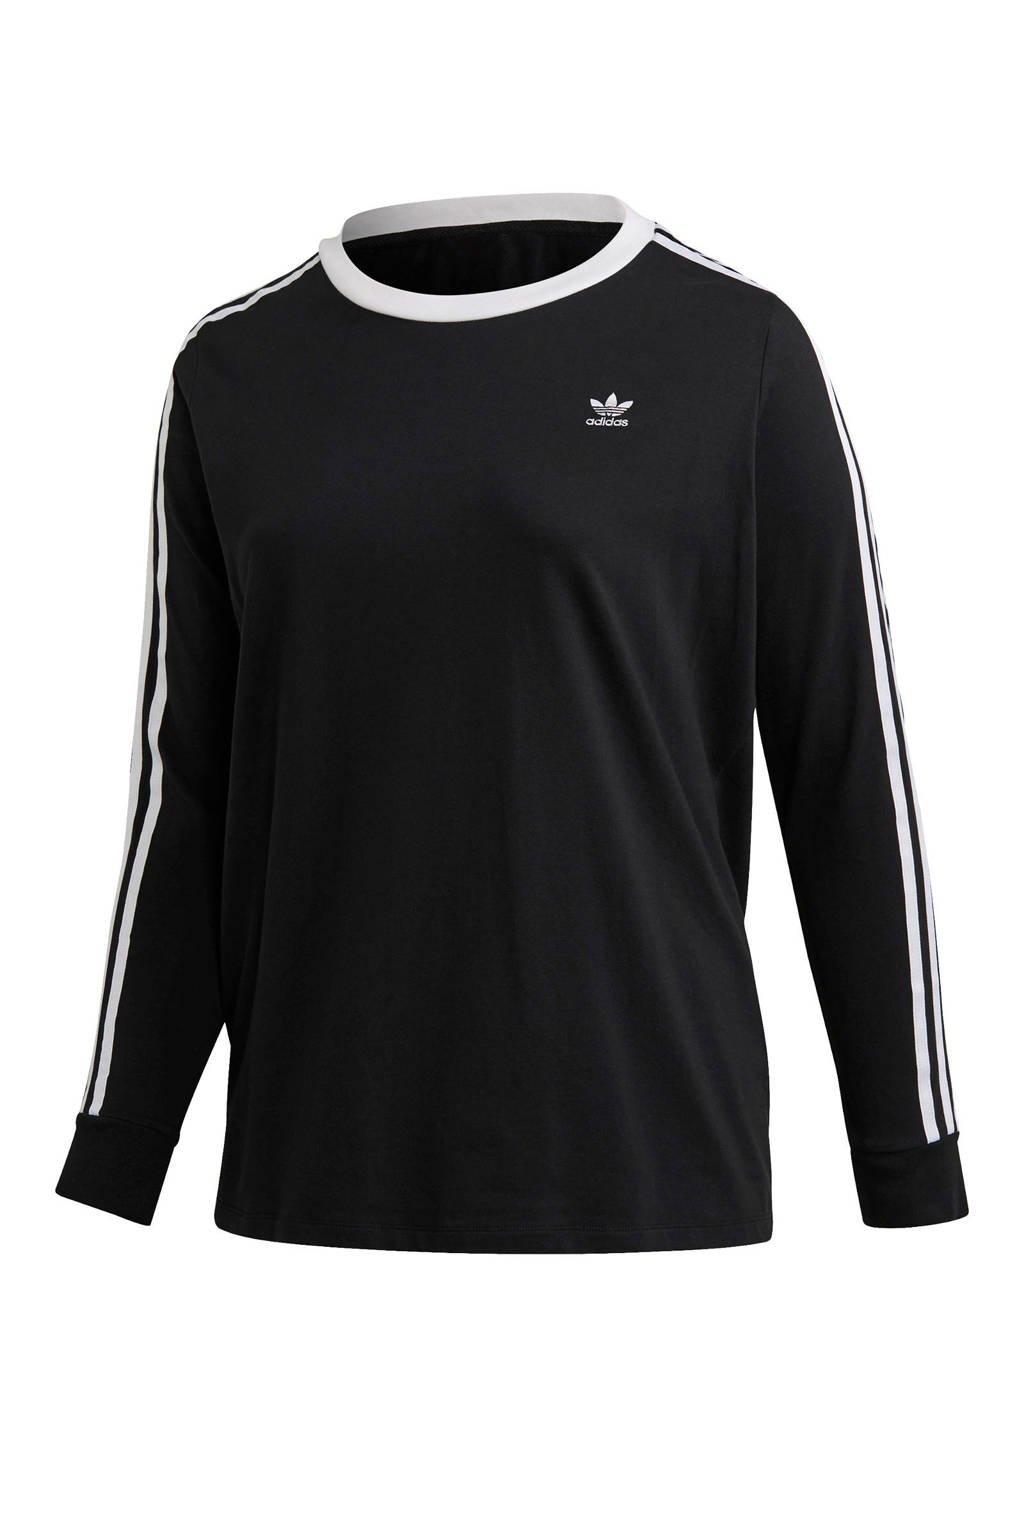 adidas Originals Adicolor Plus Size T-shirt zwart, Zwart